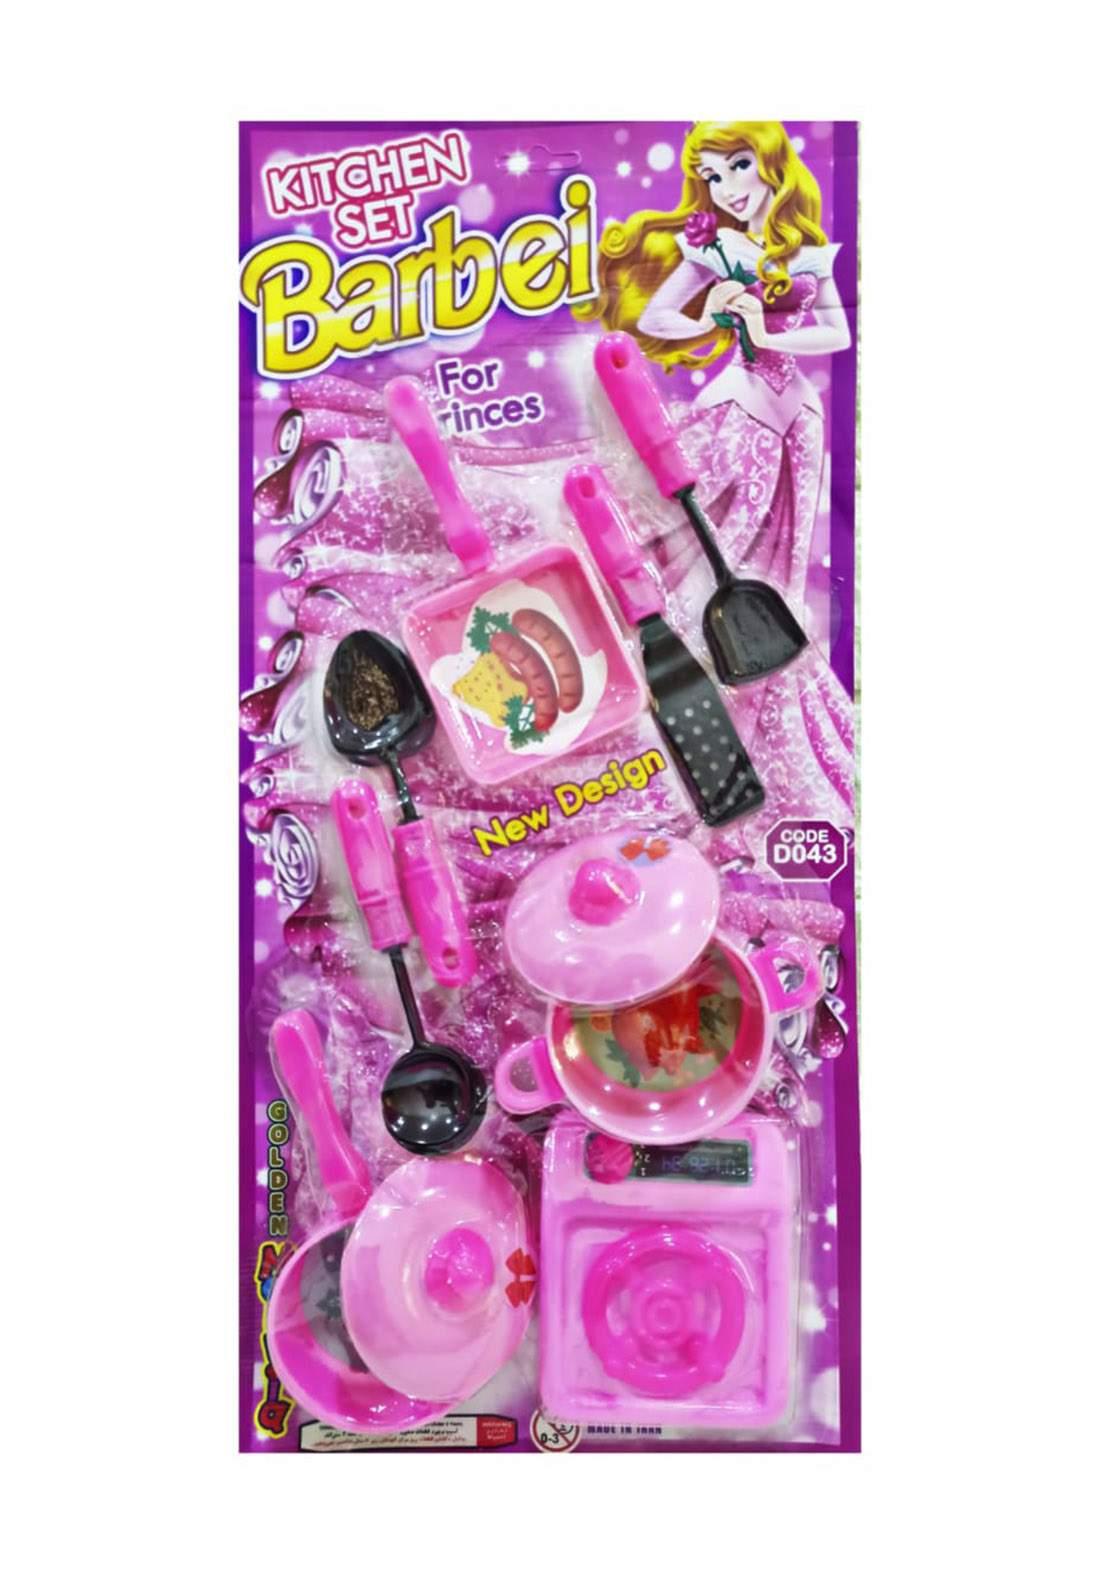 Golden Mattia  D043 Kitchen utensils Toy for Kids لعبة ادوات المطبخ للأطفال